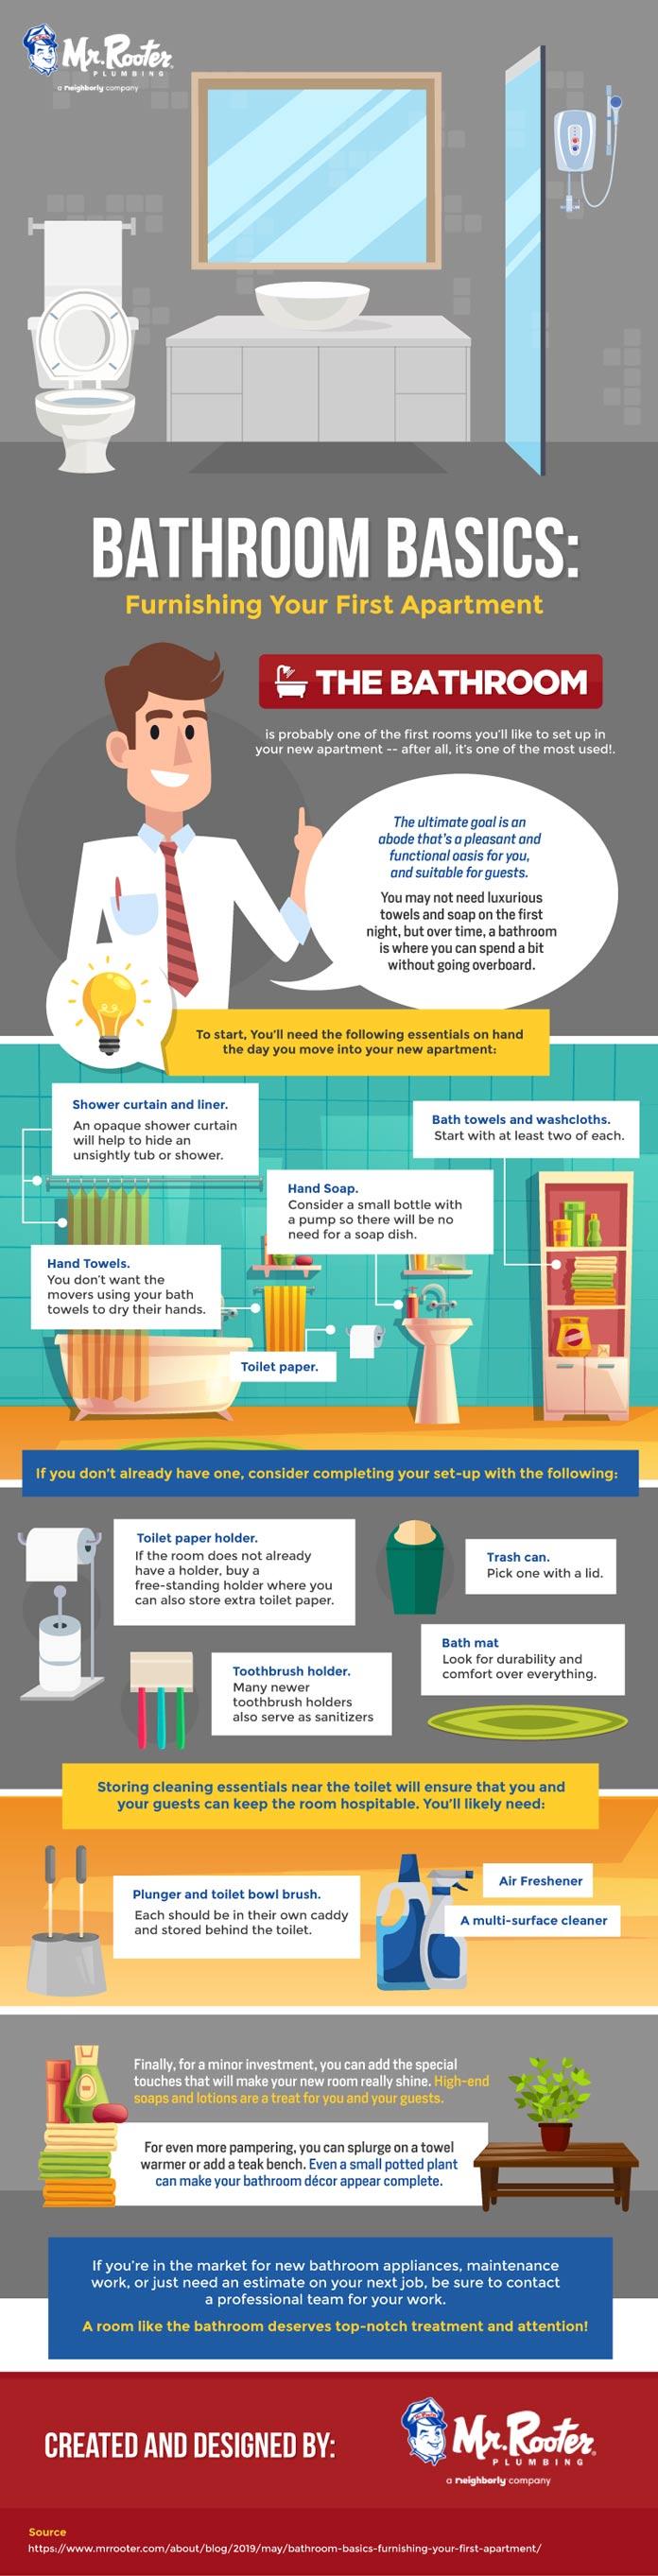 Bathroom Basics: Furnishing Your First Apartment 4